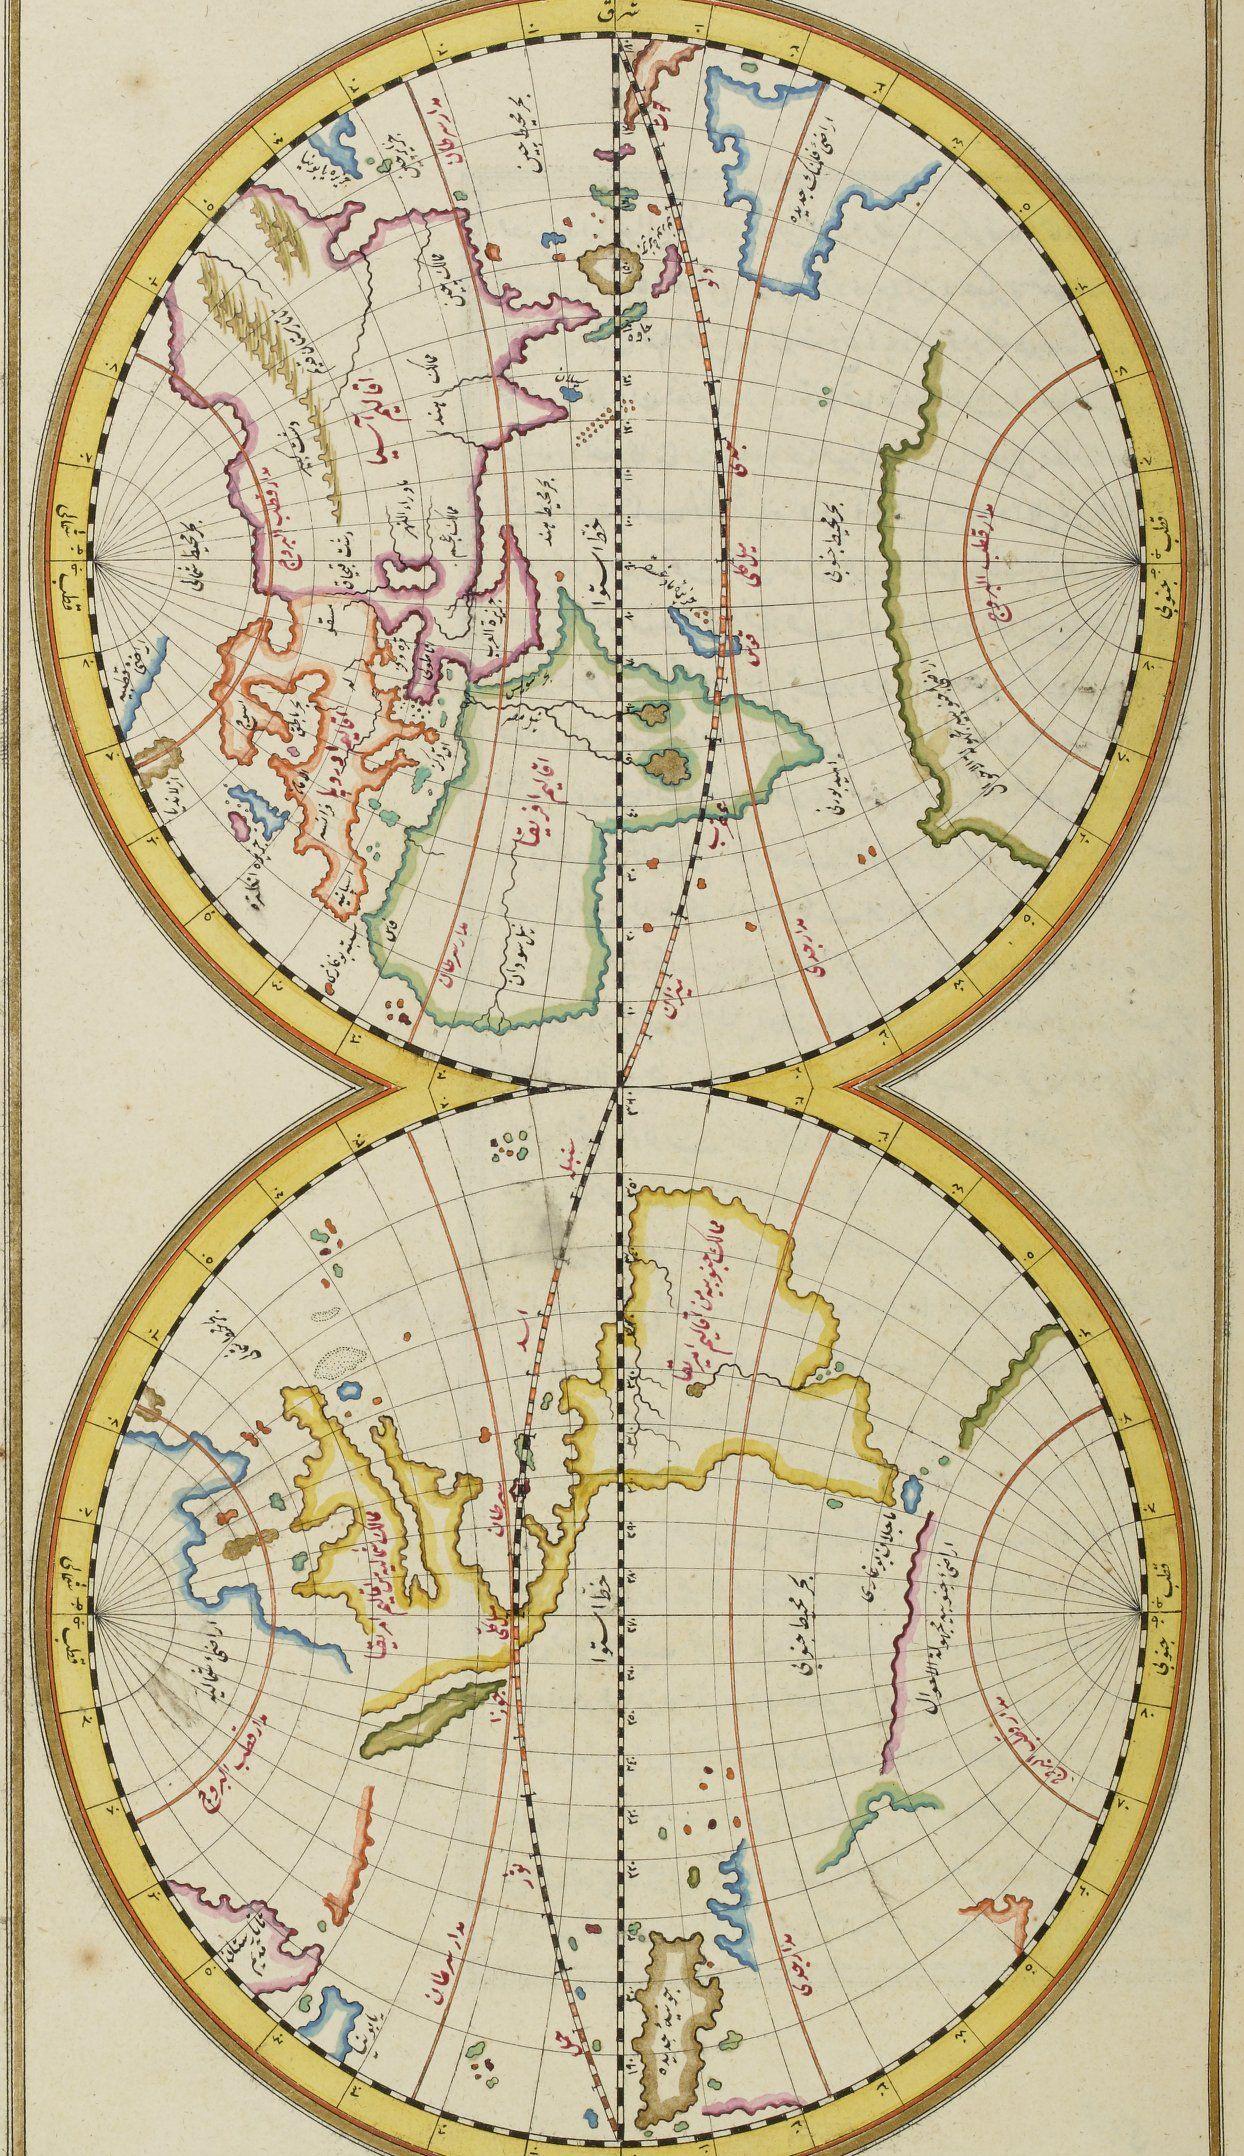 Katib elebi 1729 maps pinterest cartography islamic art and sanat gumiabroncs Image collections